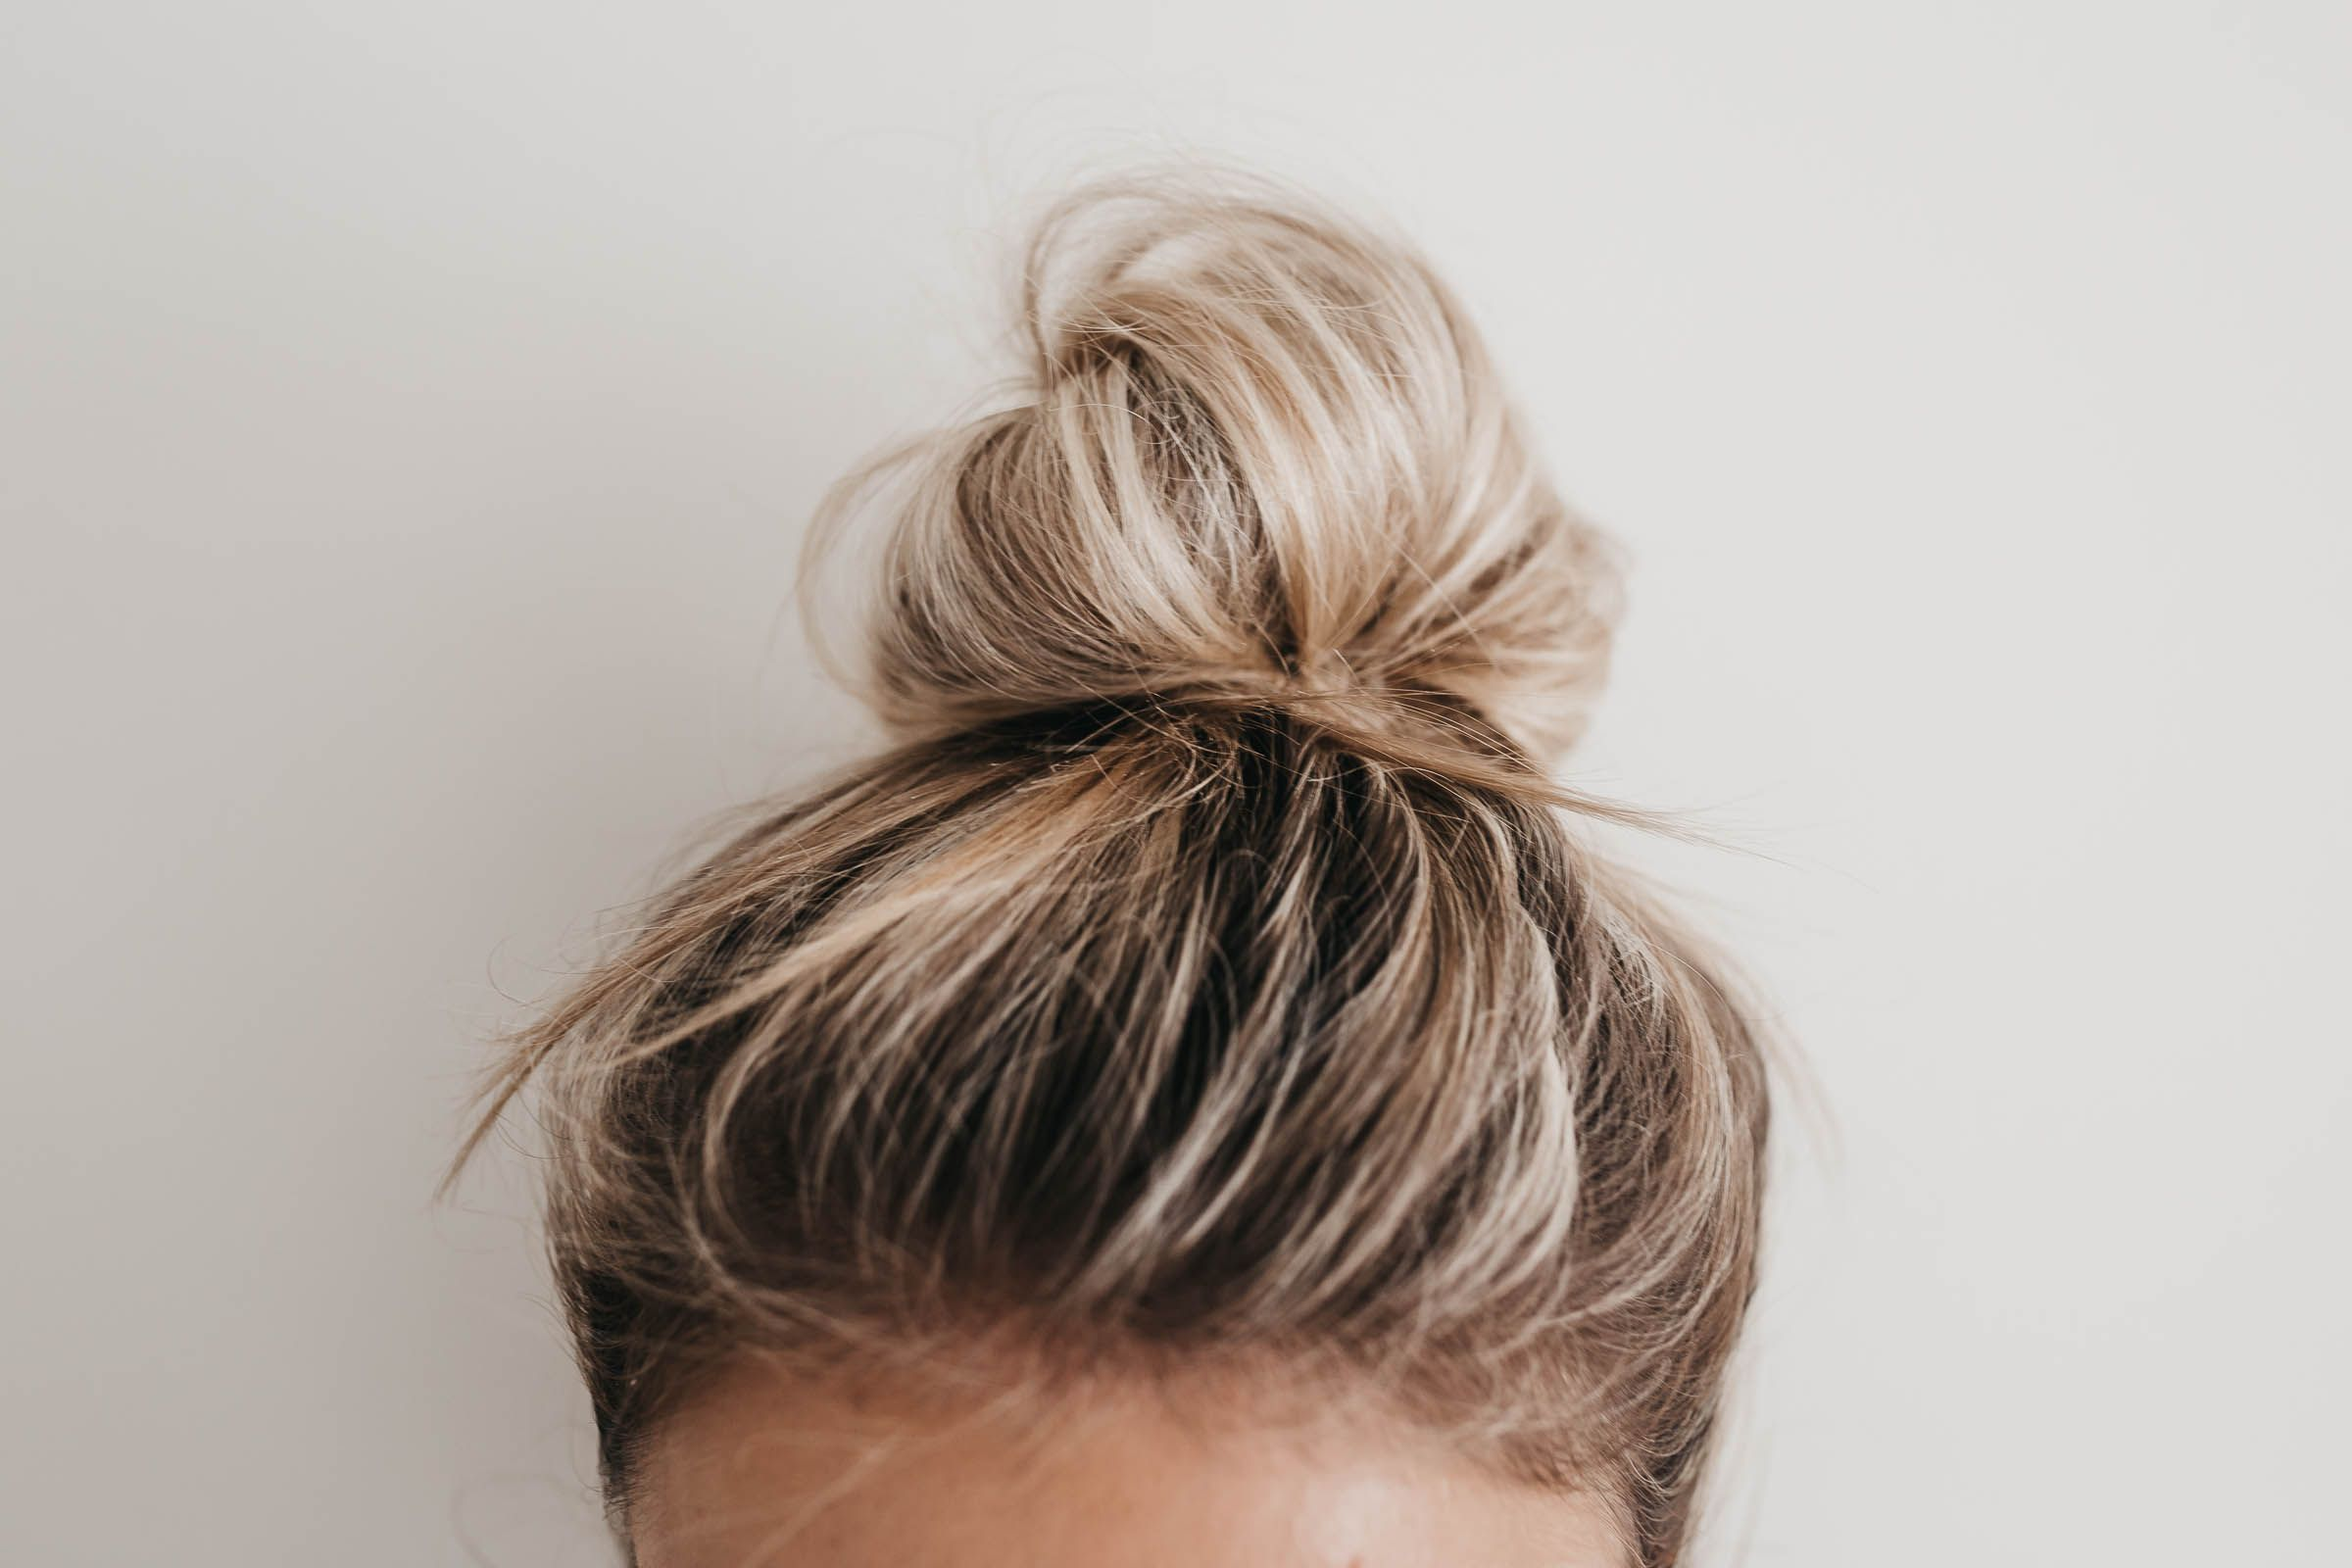 Topknot Tutorial Styled Snapshots Messy Bun For Short Hair Top Knot Tutorial Short Hair Tutorial